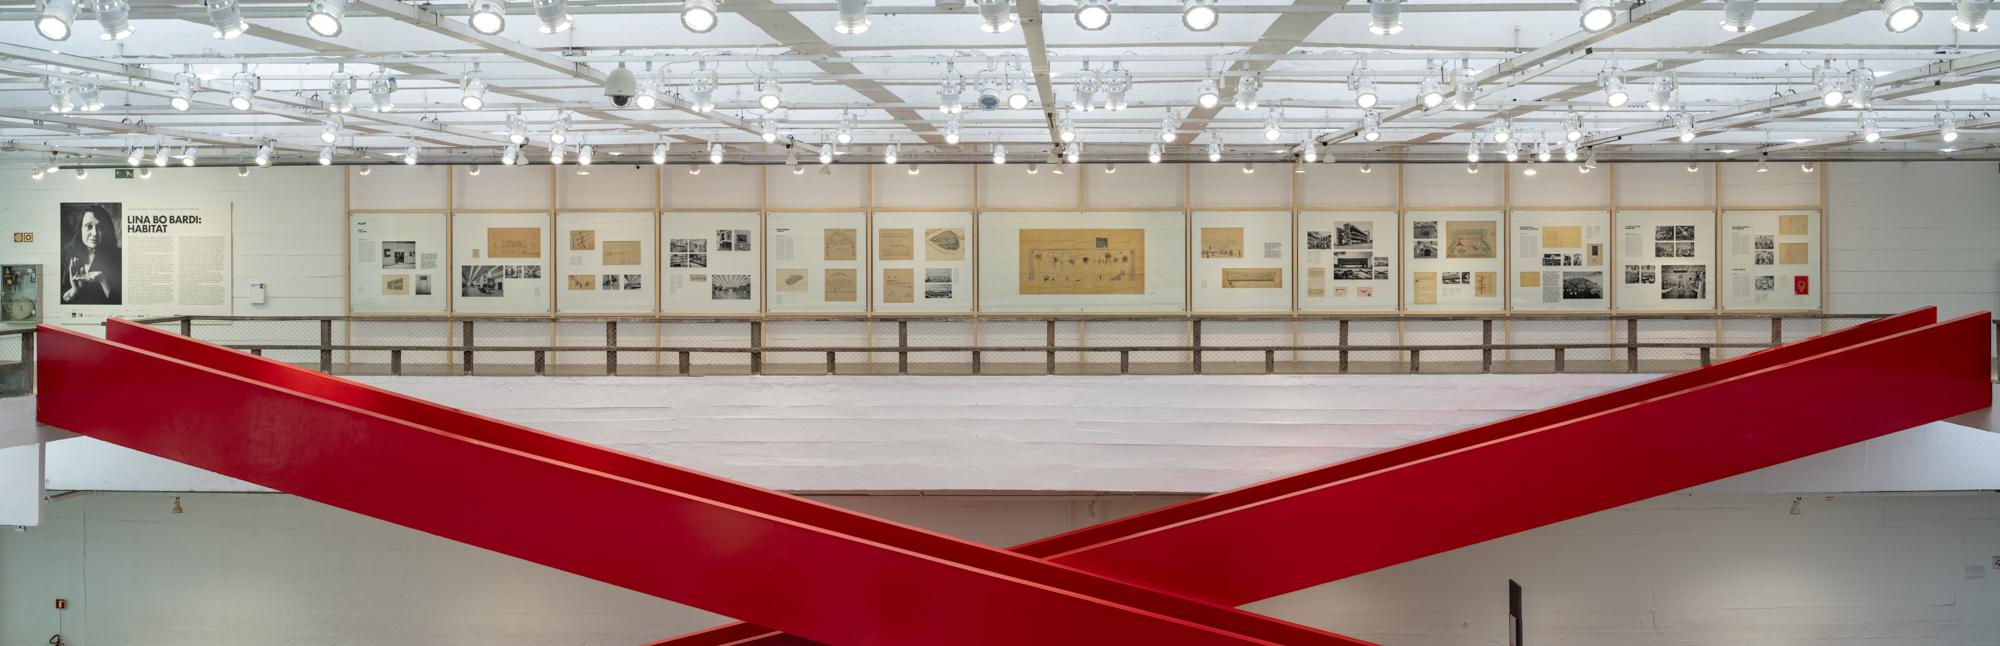 Lina Bo Bardi: Habitat , vista da exposição, 2019. Foto:  ©  Eduardo Ortega – cortesia MASP.